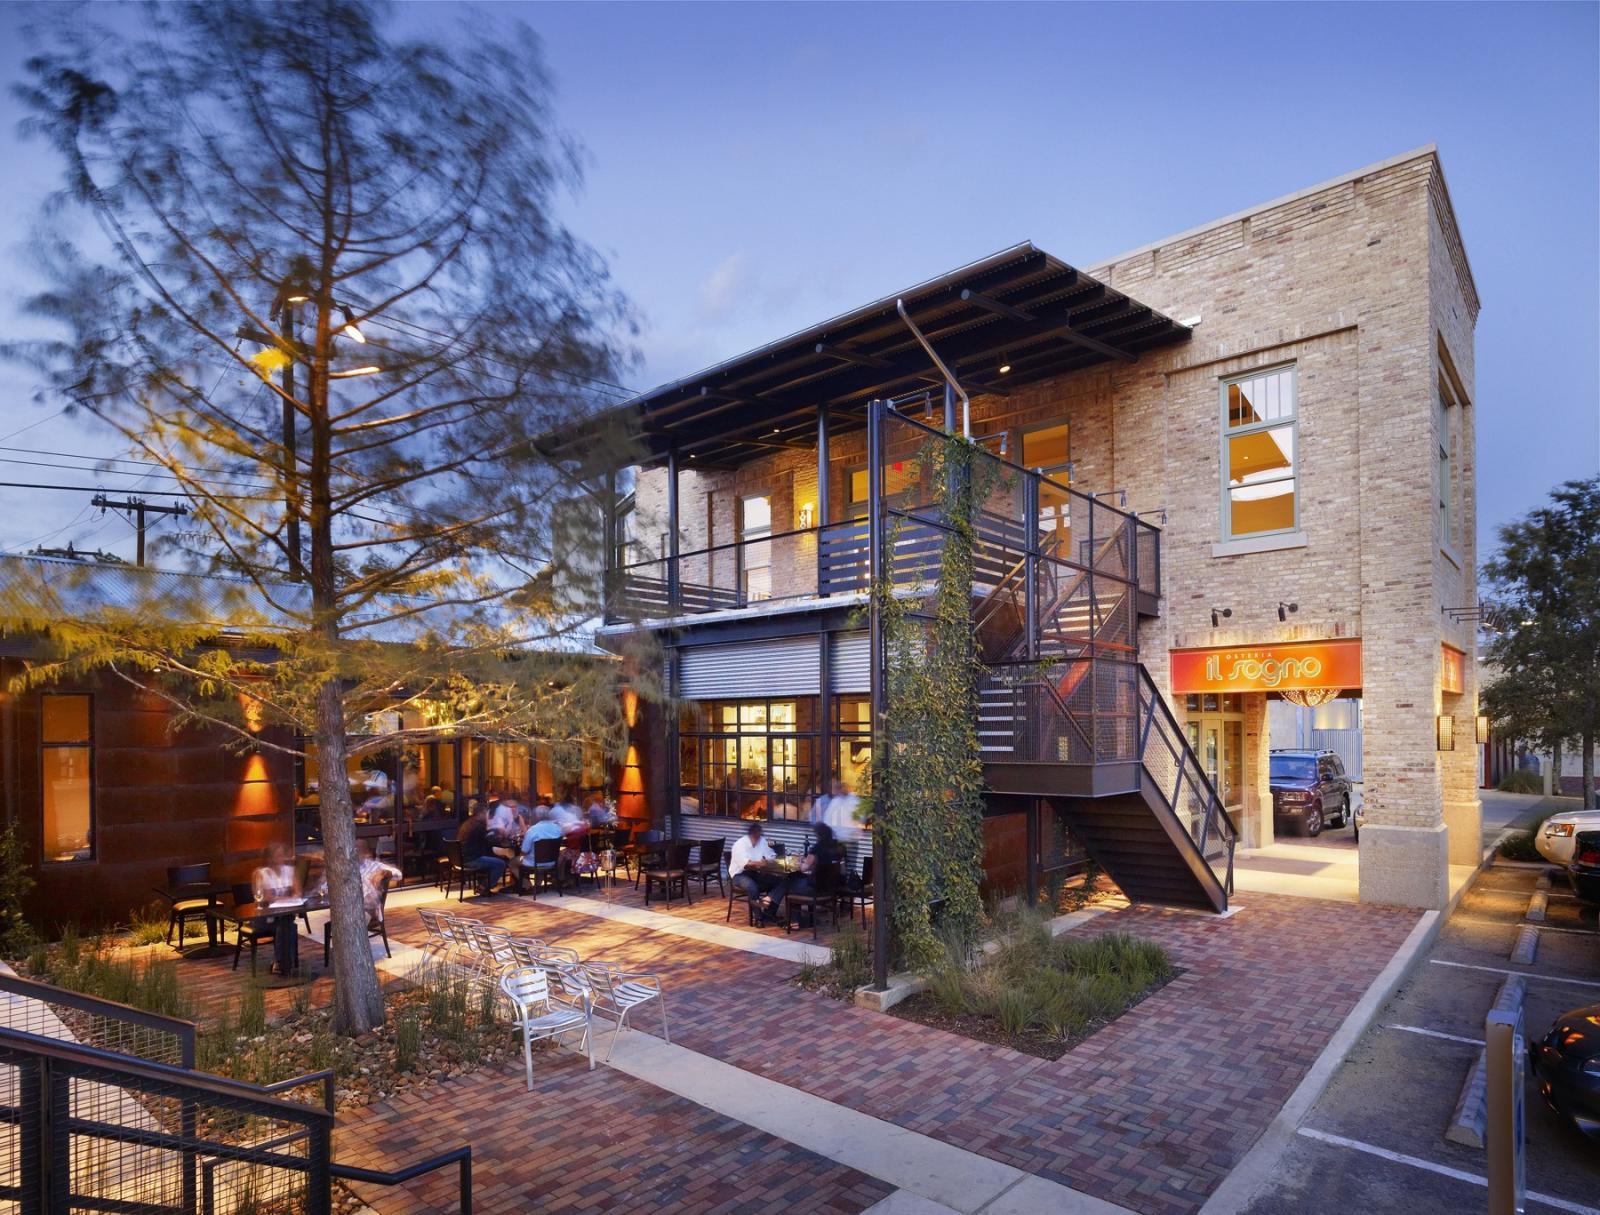 Il Sogno Restaurant  Lake Flato